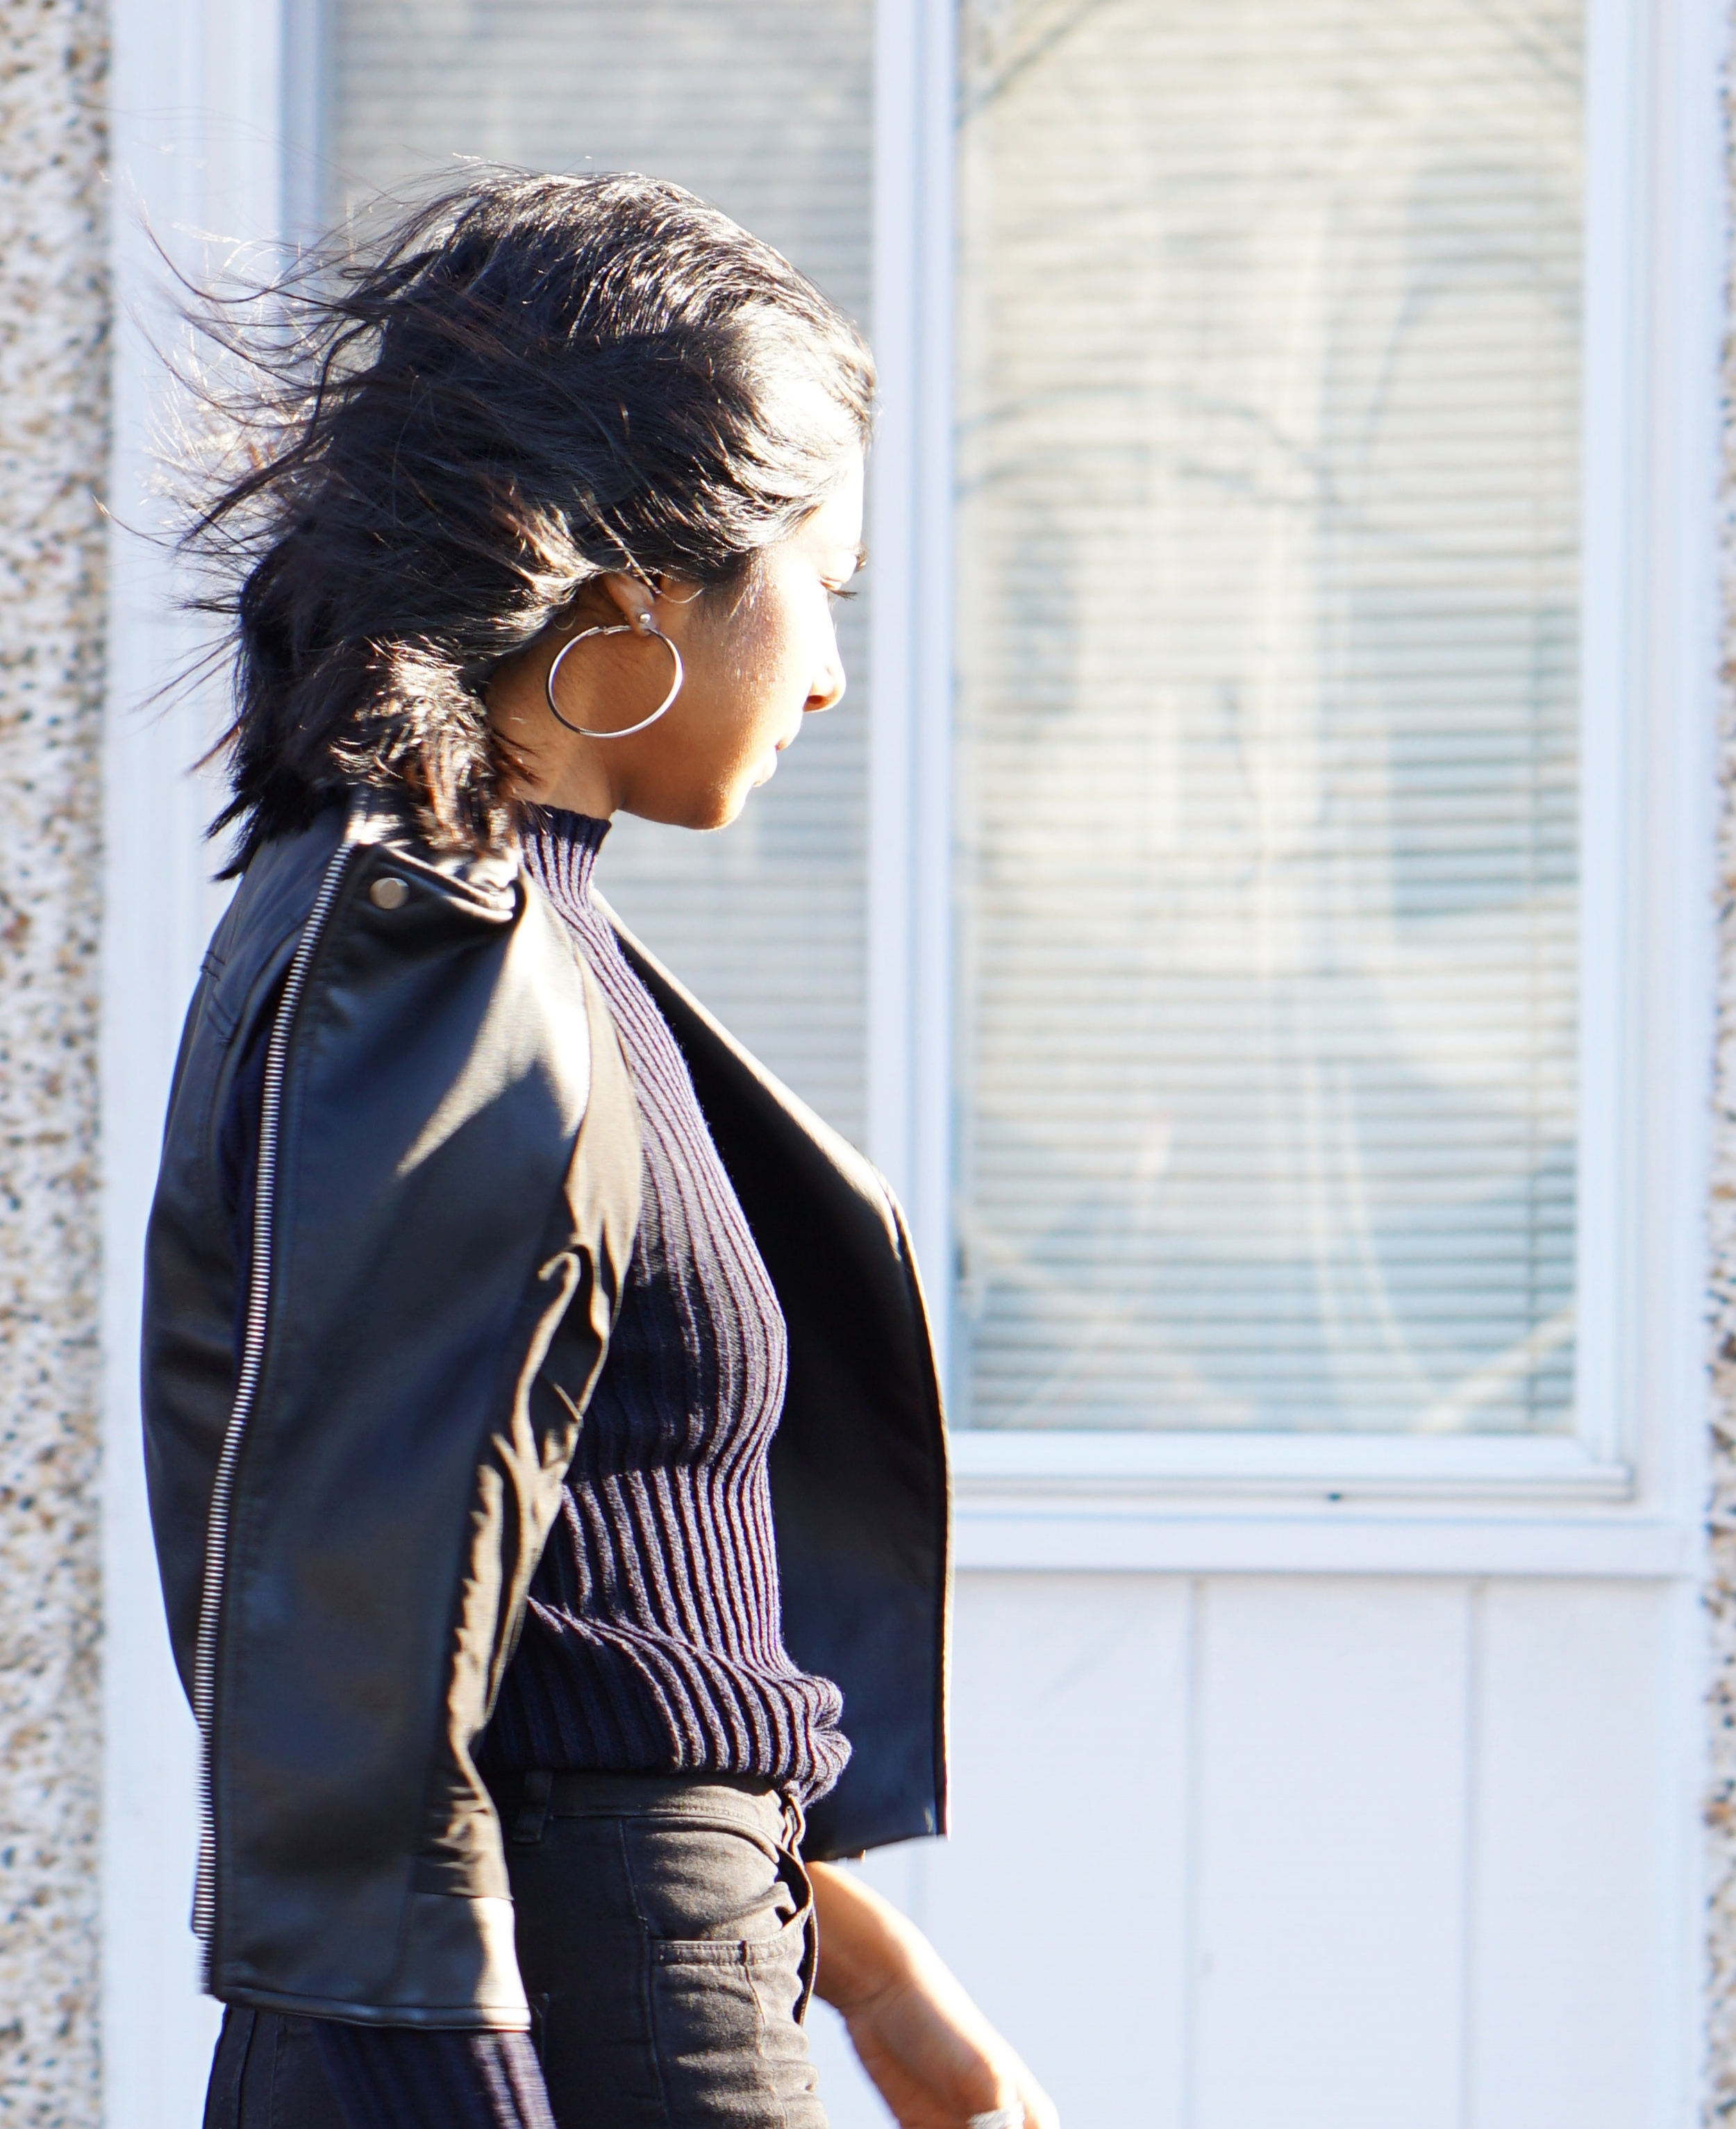 top -  ASOS   vest - Zara  pants -  H&M   shoes -  H&M   earrings -  ASOS   pin -  bando